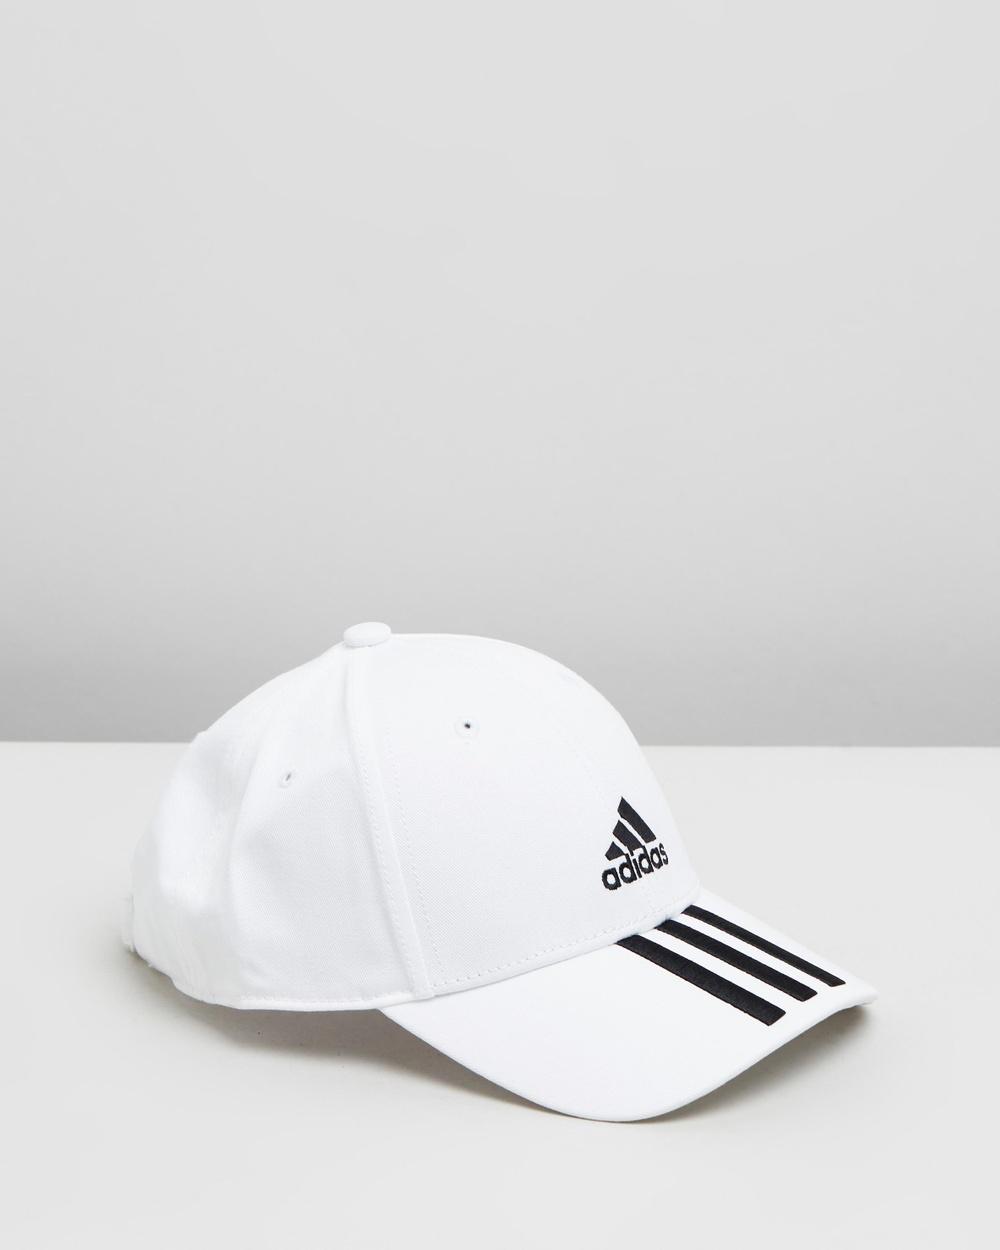 adidas Performance 3 Stripes Twill Cap Headwear White & Black 3-Stripes